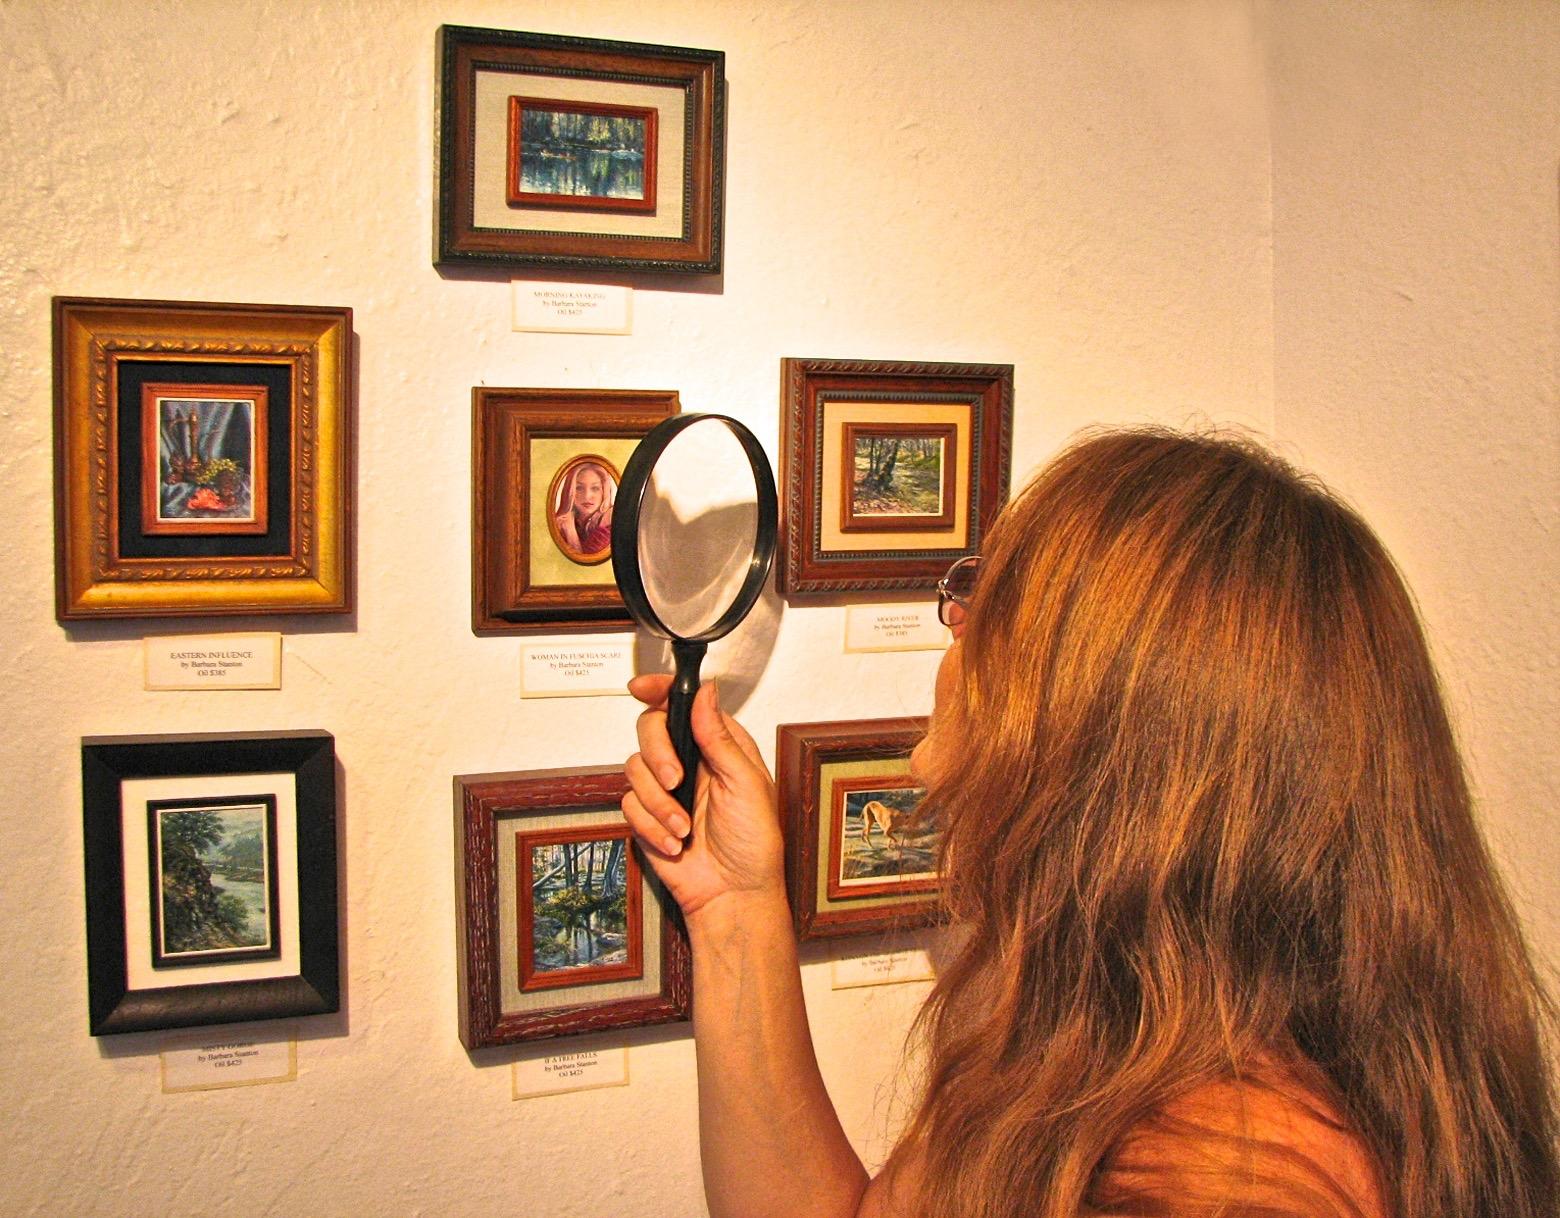 Barbara at Mendocino art show